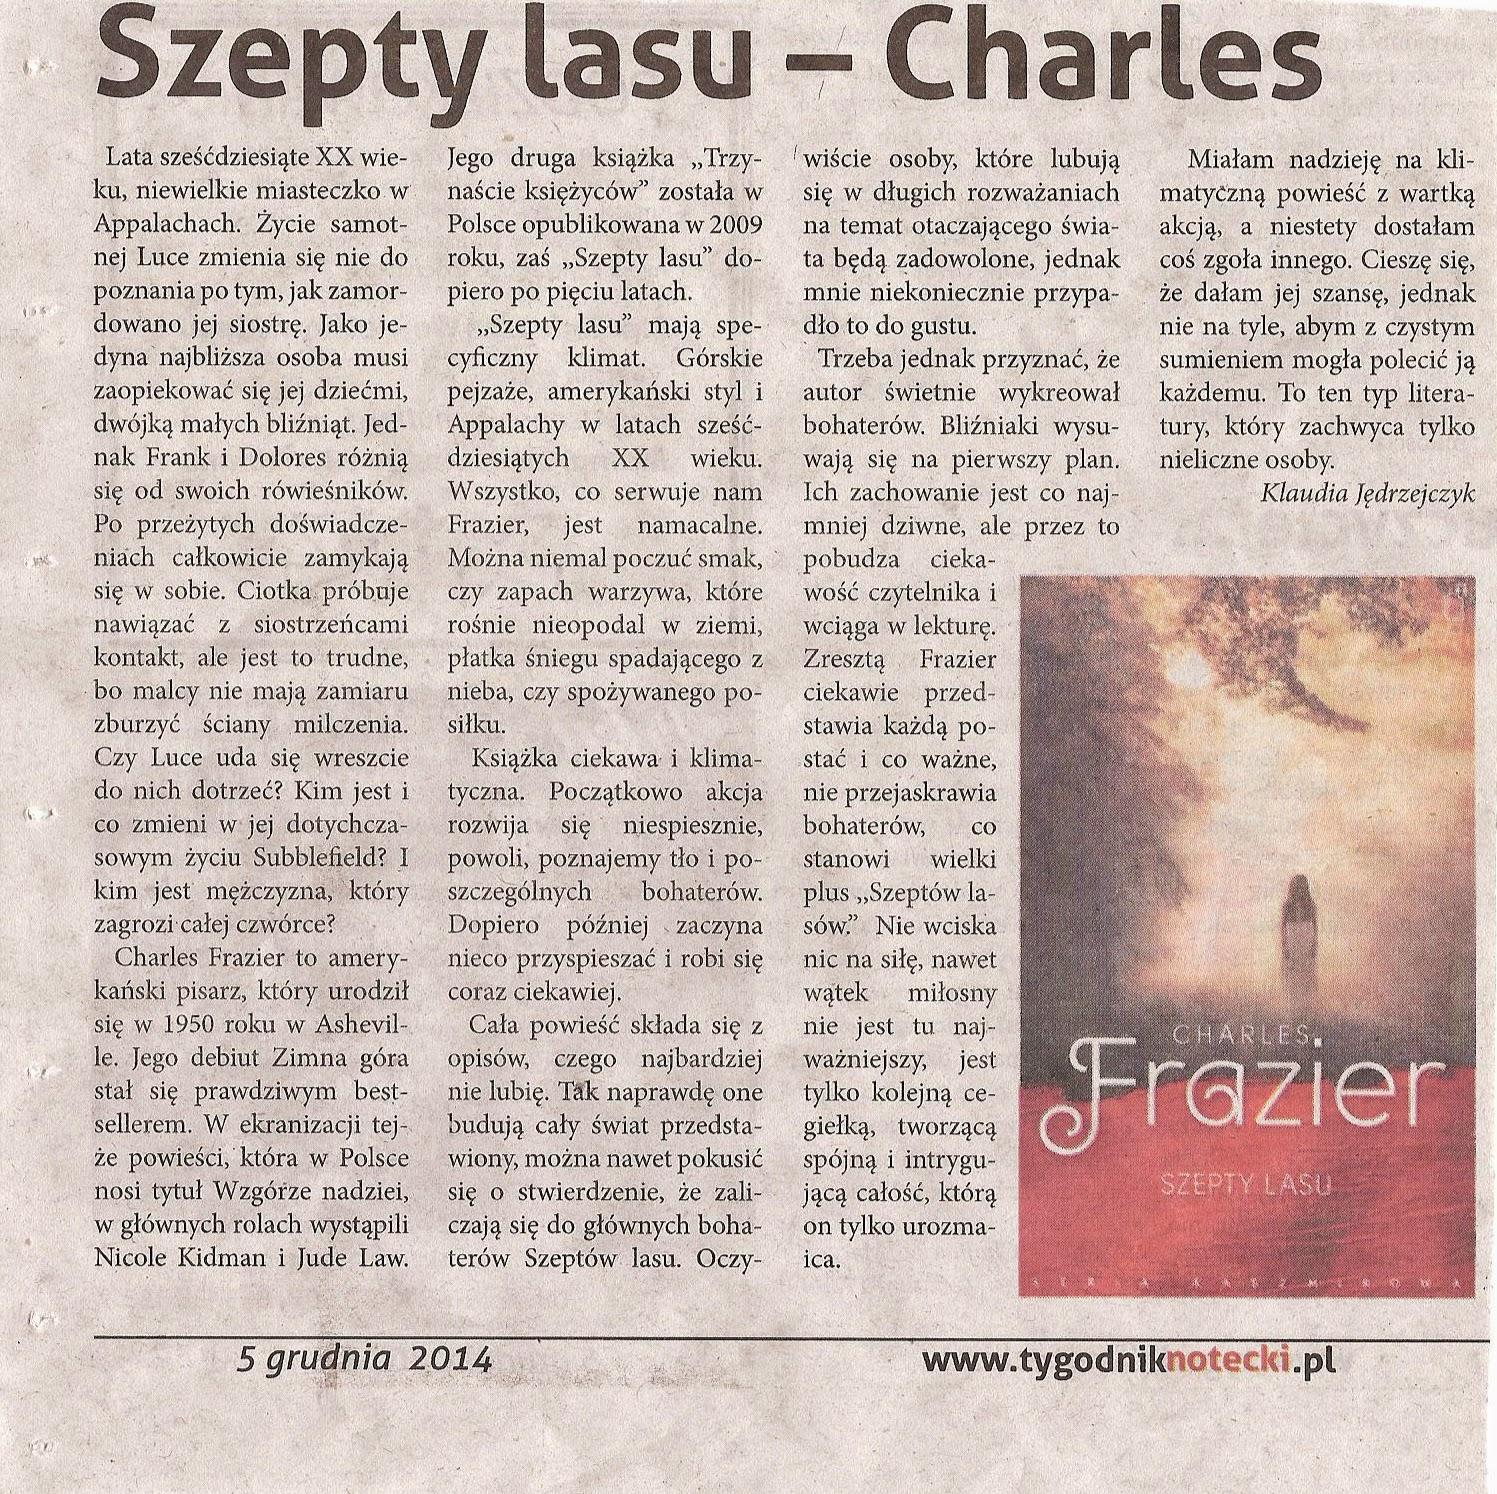 Photo: http://szeptksiazek.blogspot.com/2014/07/szepty-lasu-charles-frazier.html